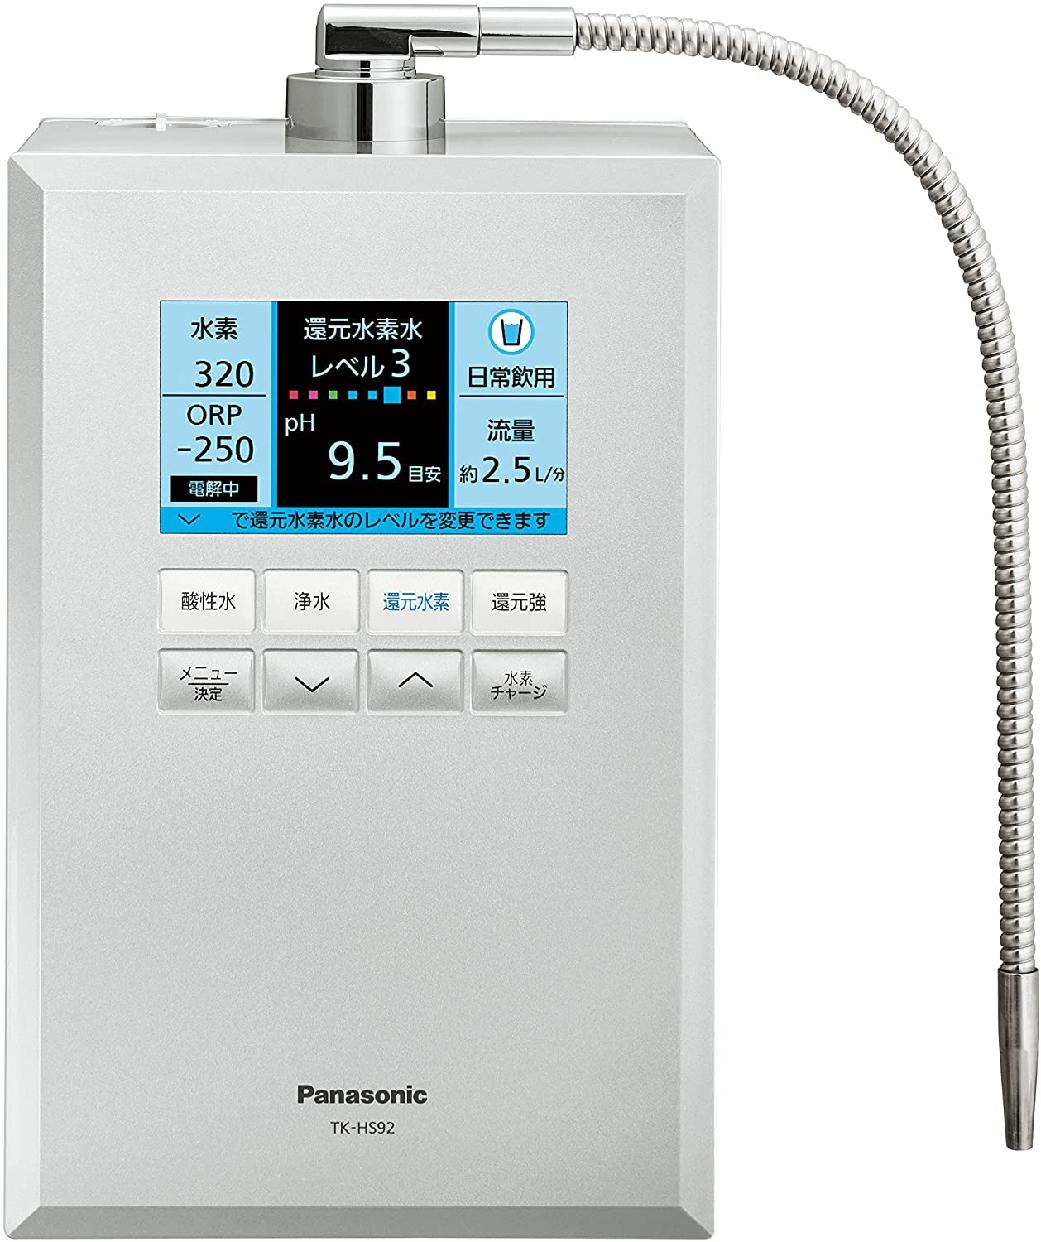 Panasonic(パナソニック)還元水素水生成器 TK-HS92の商品画像